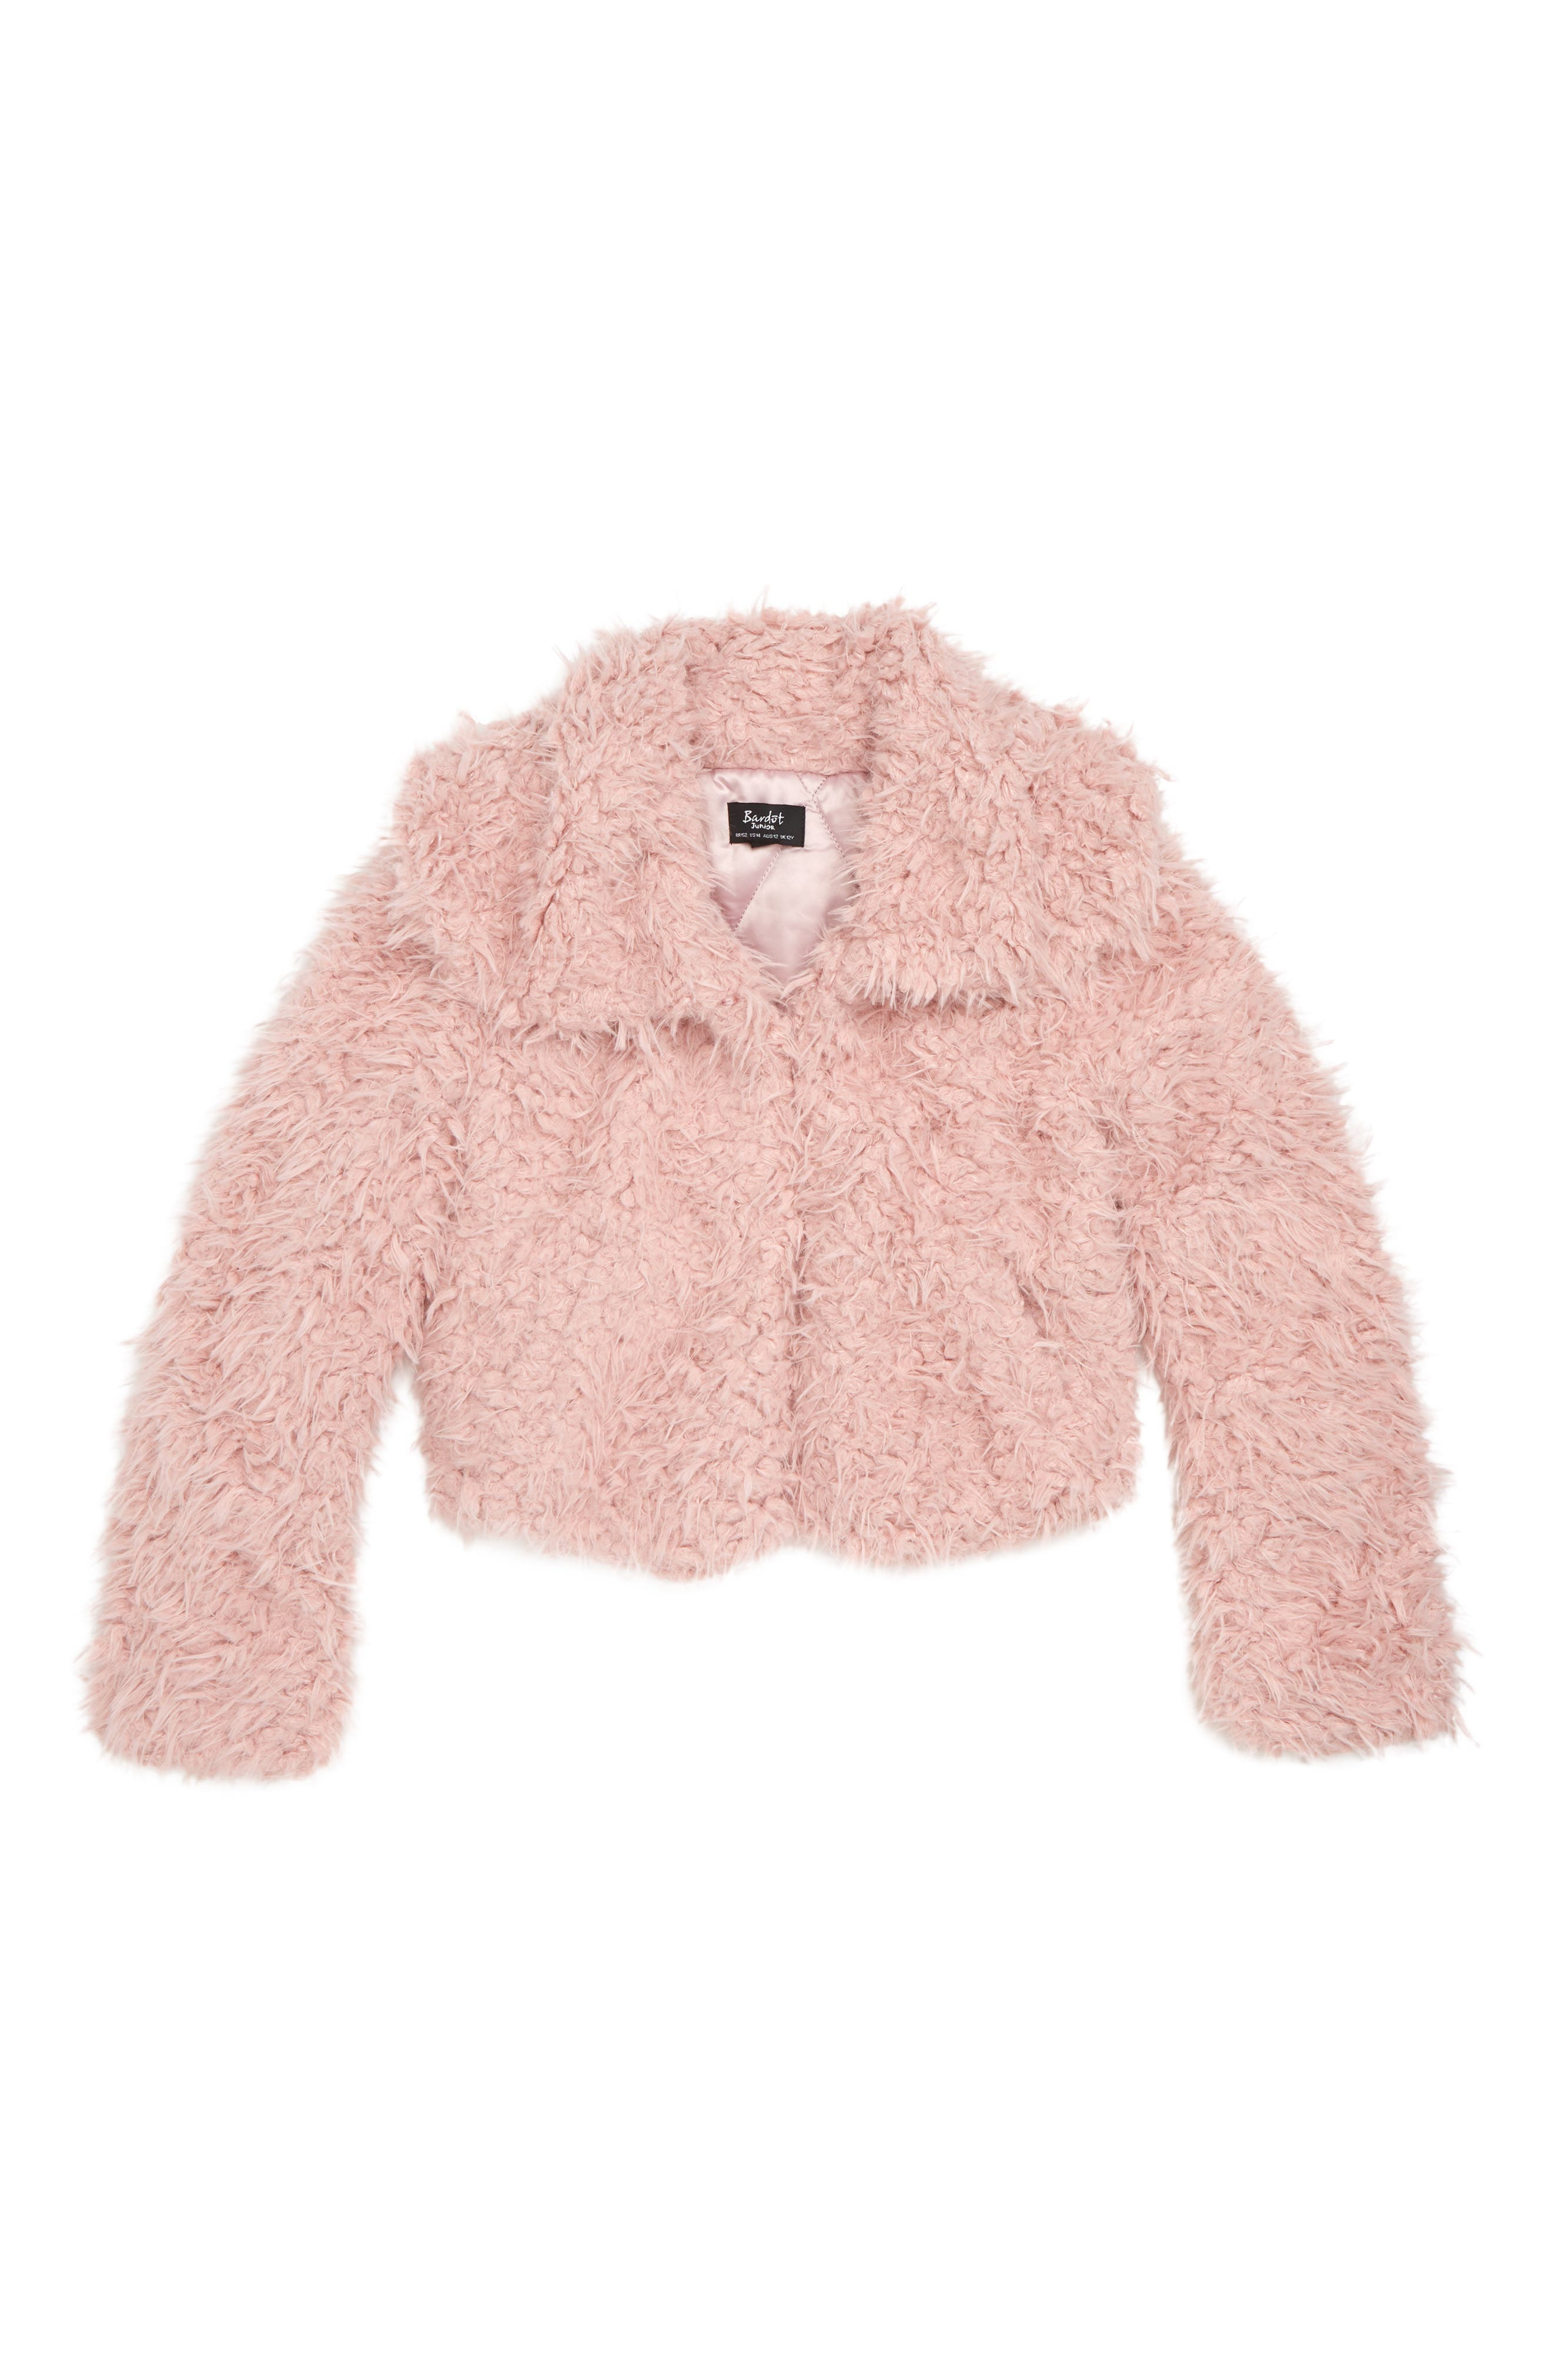 Lexi Fluffy Jacket,                         Main,                         color, 650